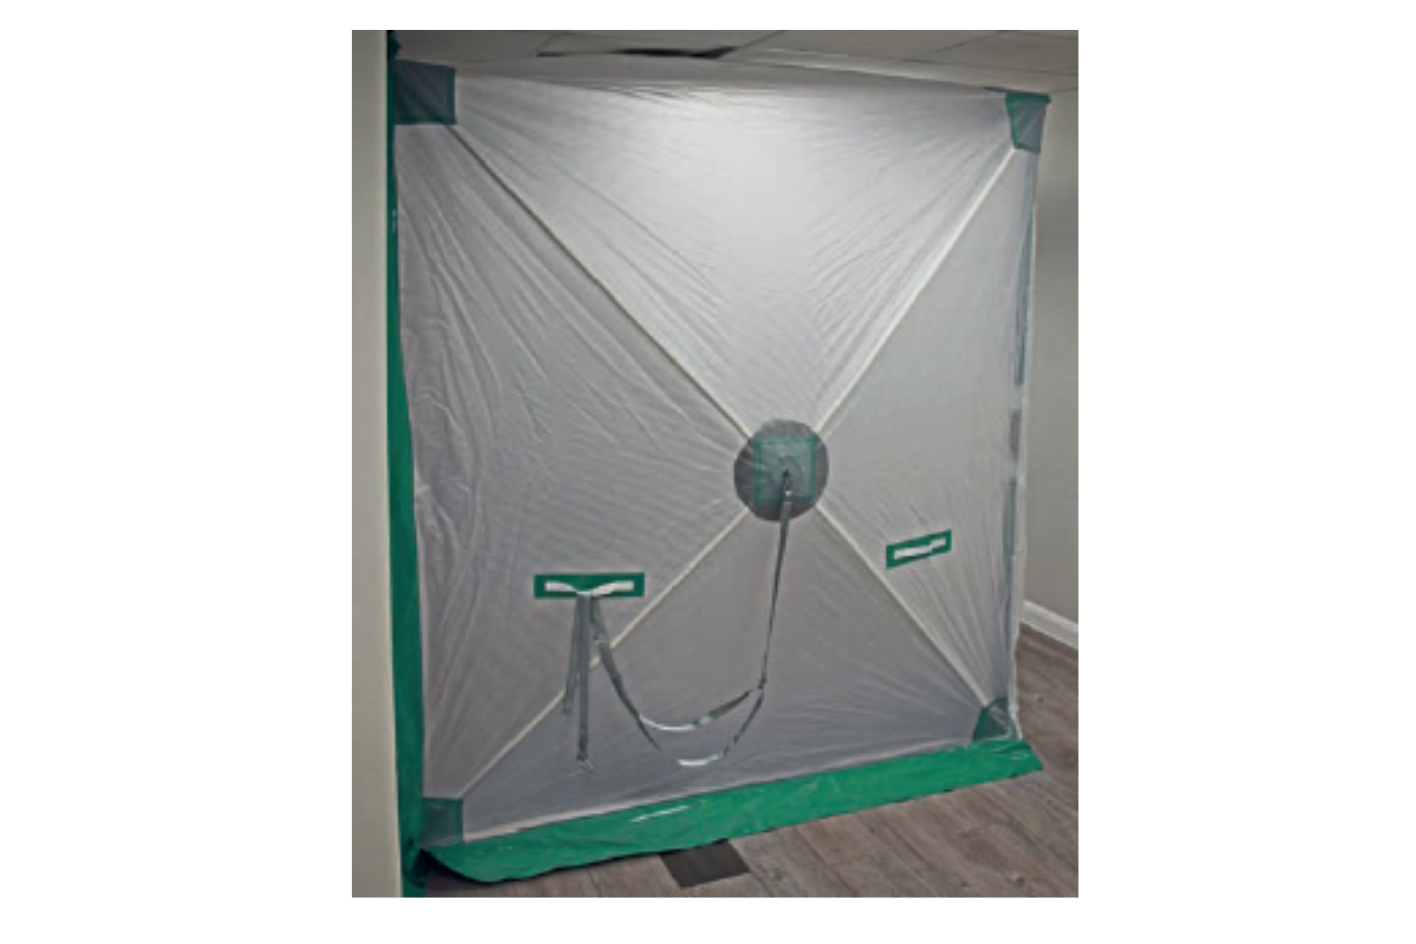 Dustex Air Lock in use 1